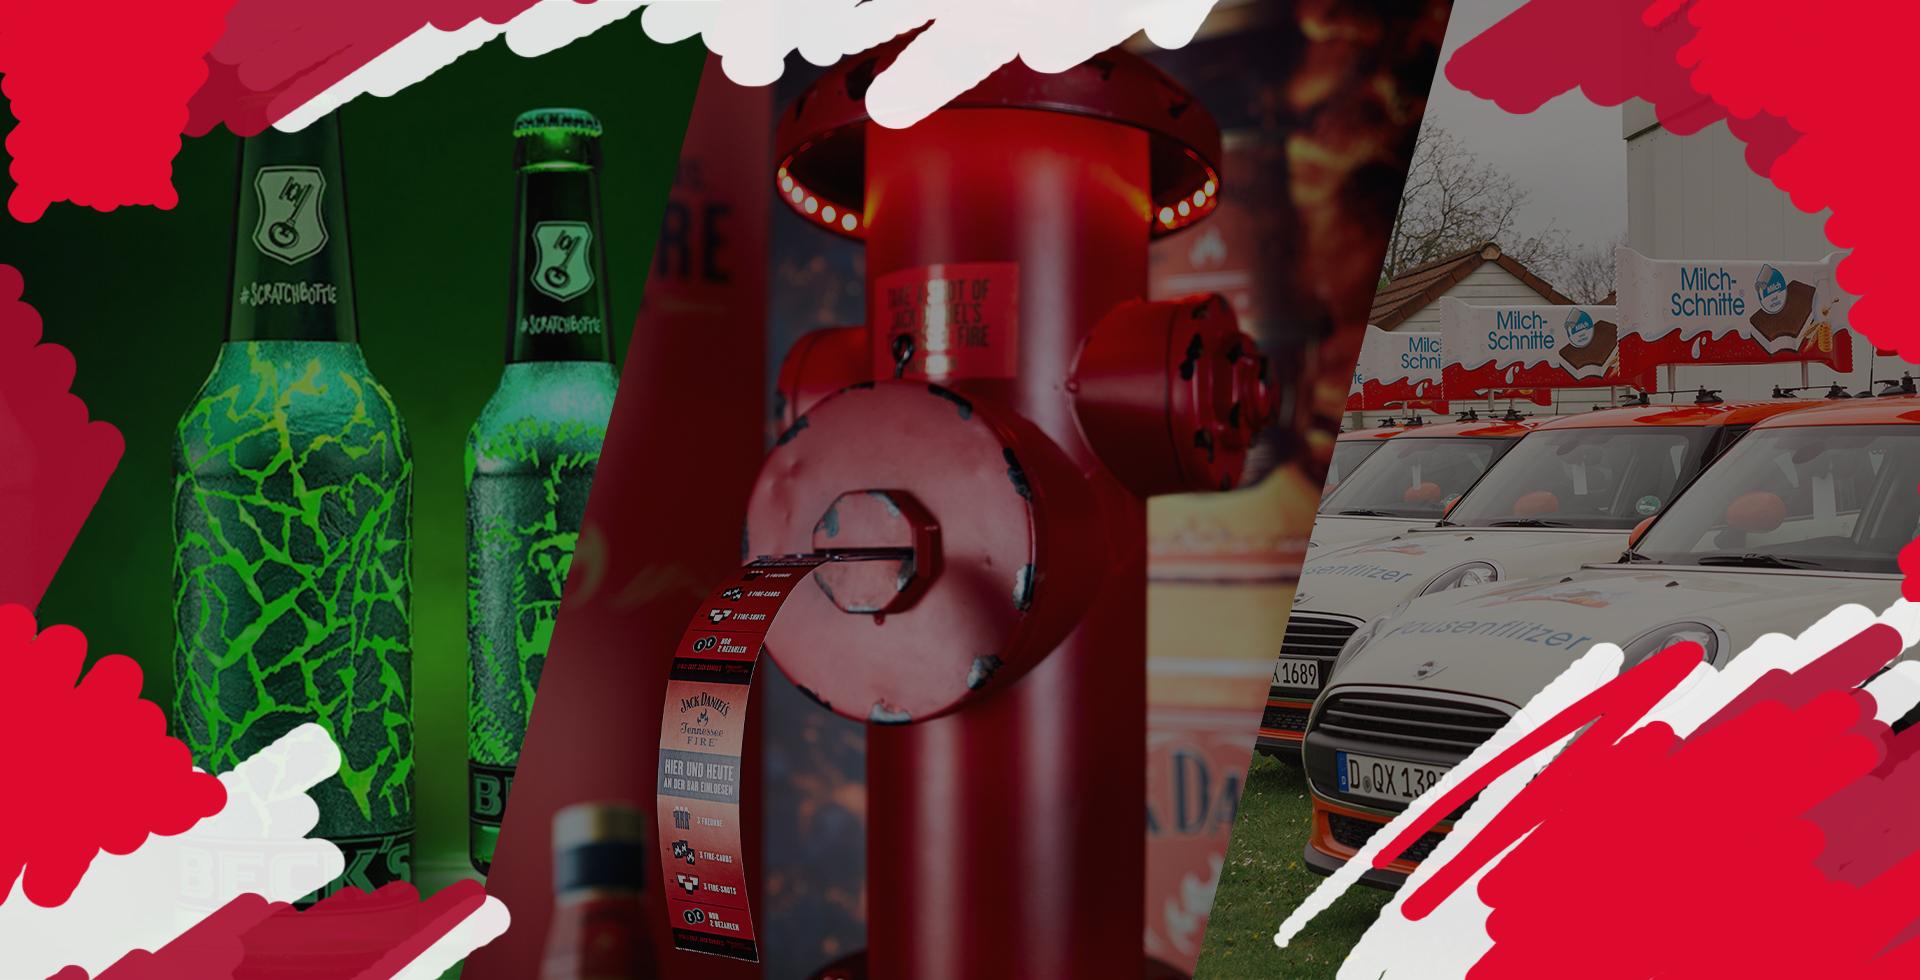 Zweyloeven GmbH - Beck's, Jack Daniel's, Ferrero - Slider